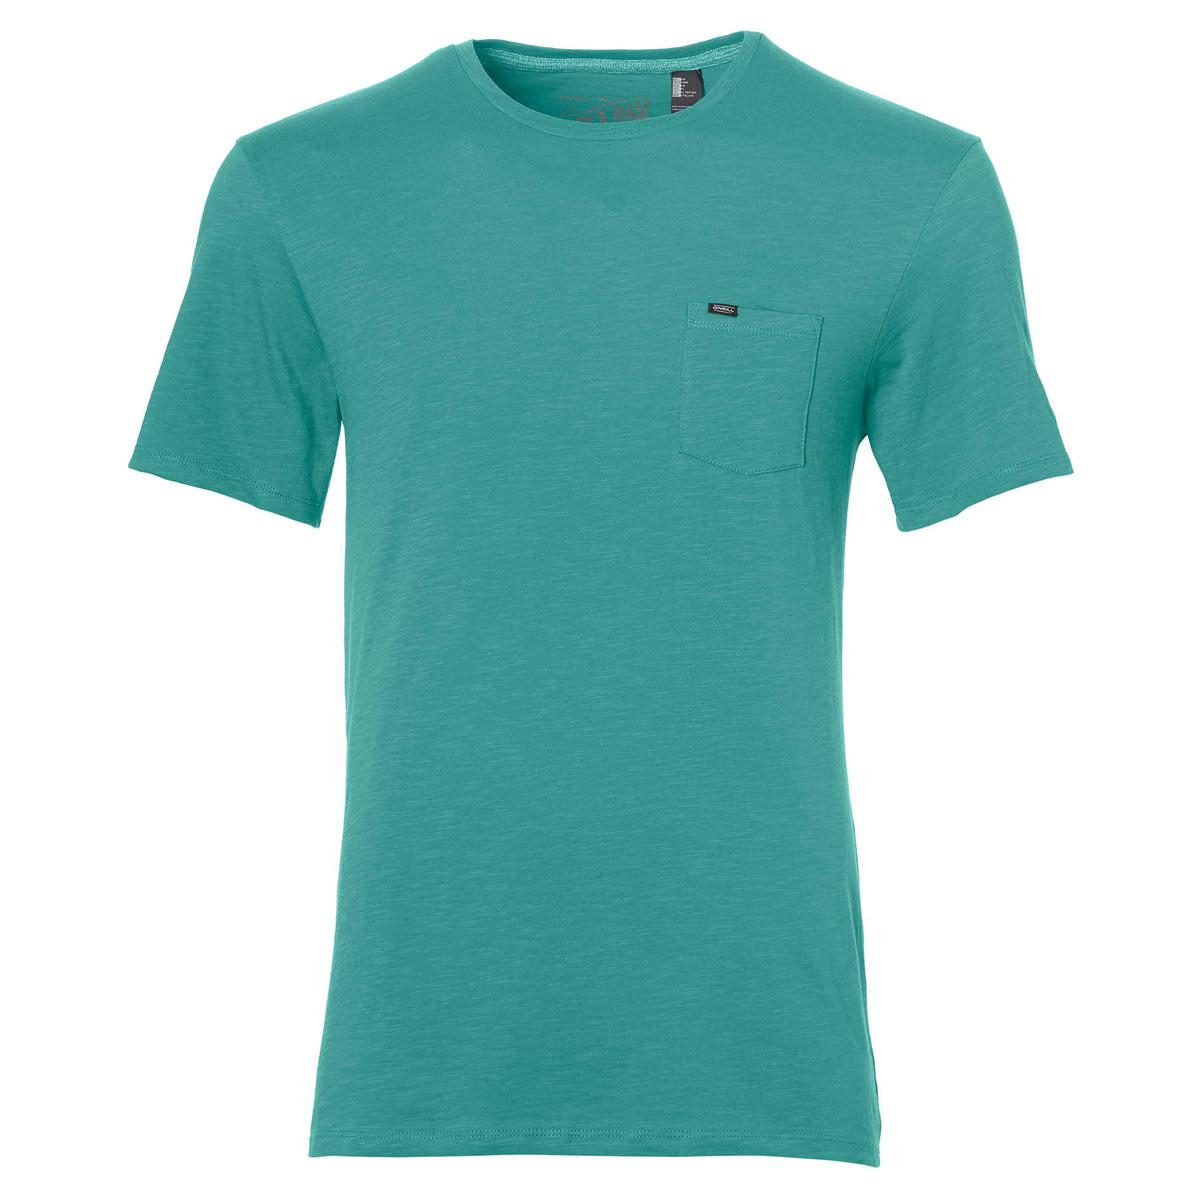 O Neill Sportswear Oneill Lm Jacks Base Ref T-shirt in Green for Men ... ff2063eff1